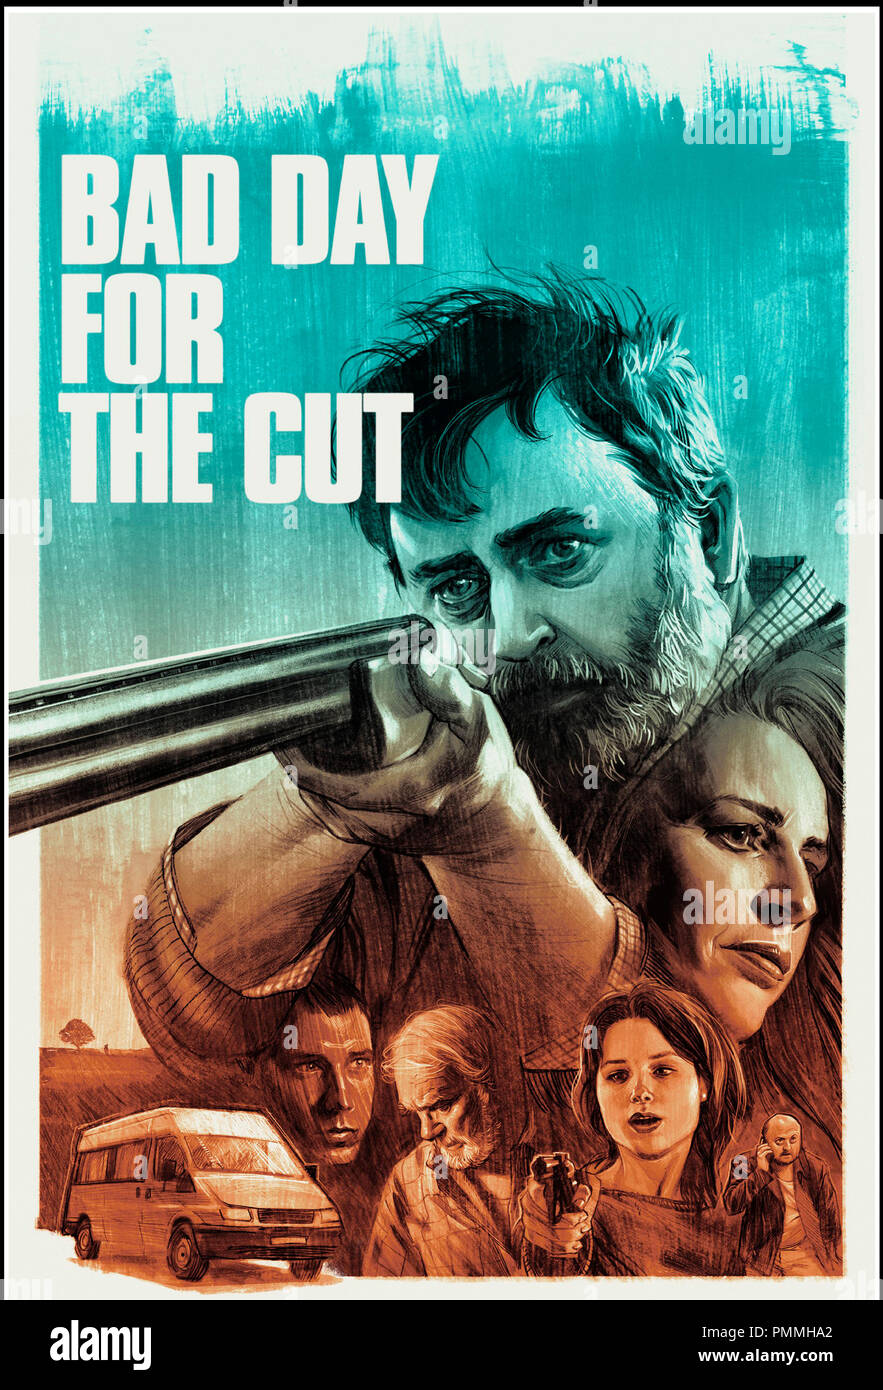 Prod Db Netflix Northern Ireland Screen Six Mile Hill Productions Xyz Films Yellowmoon Dr Bad Day For The Cut De Chris Baugh 2017 Gb Visuel D